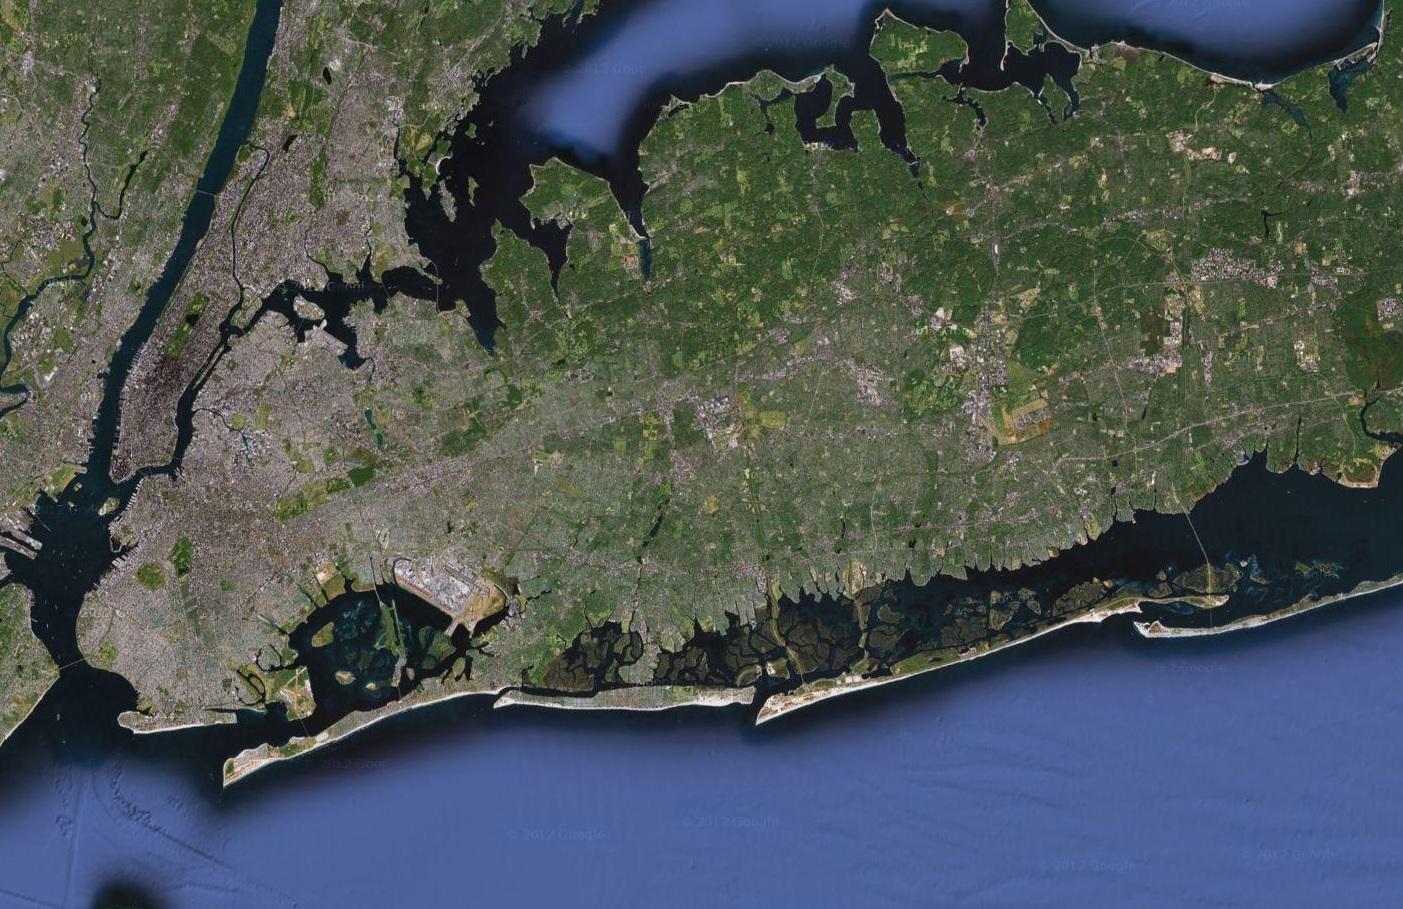 Duc me con so long beach - Duc Me Con So O Long Beach Is Extremely Similar To South Shore Estuary Reserve